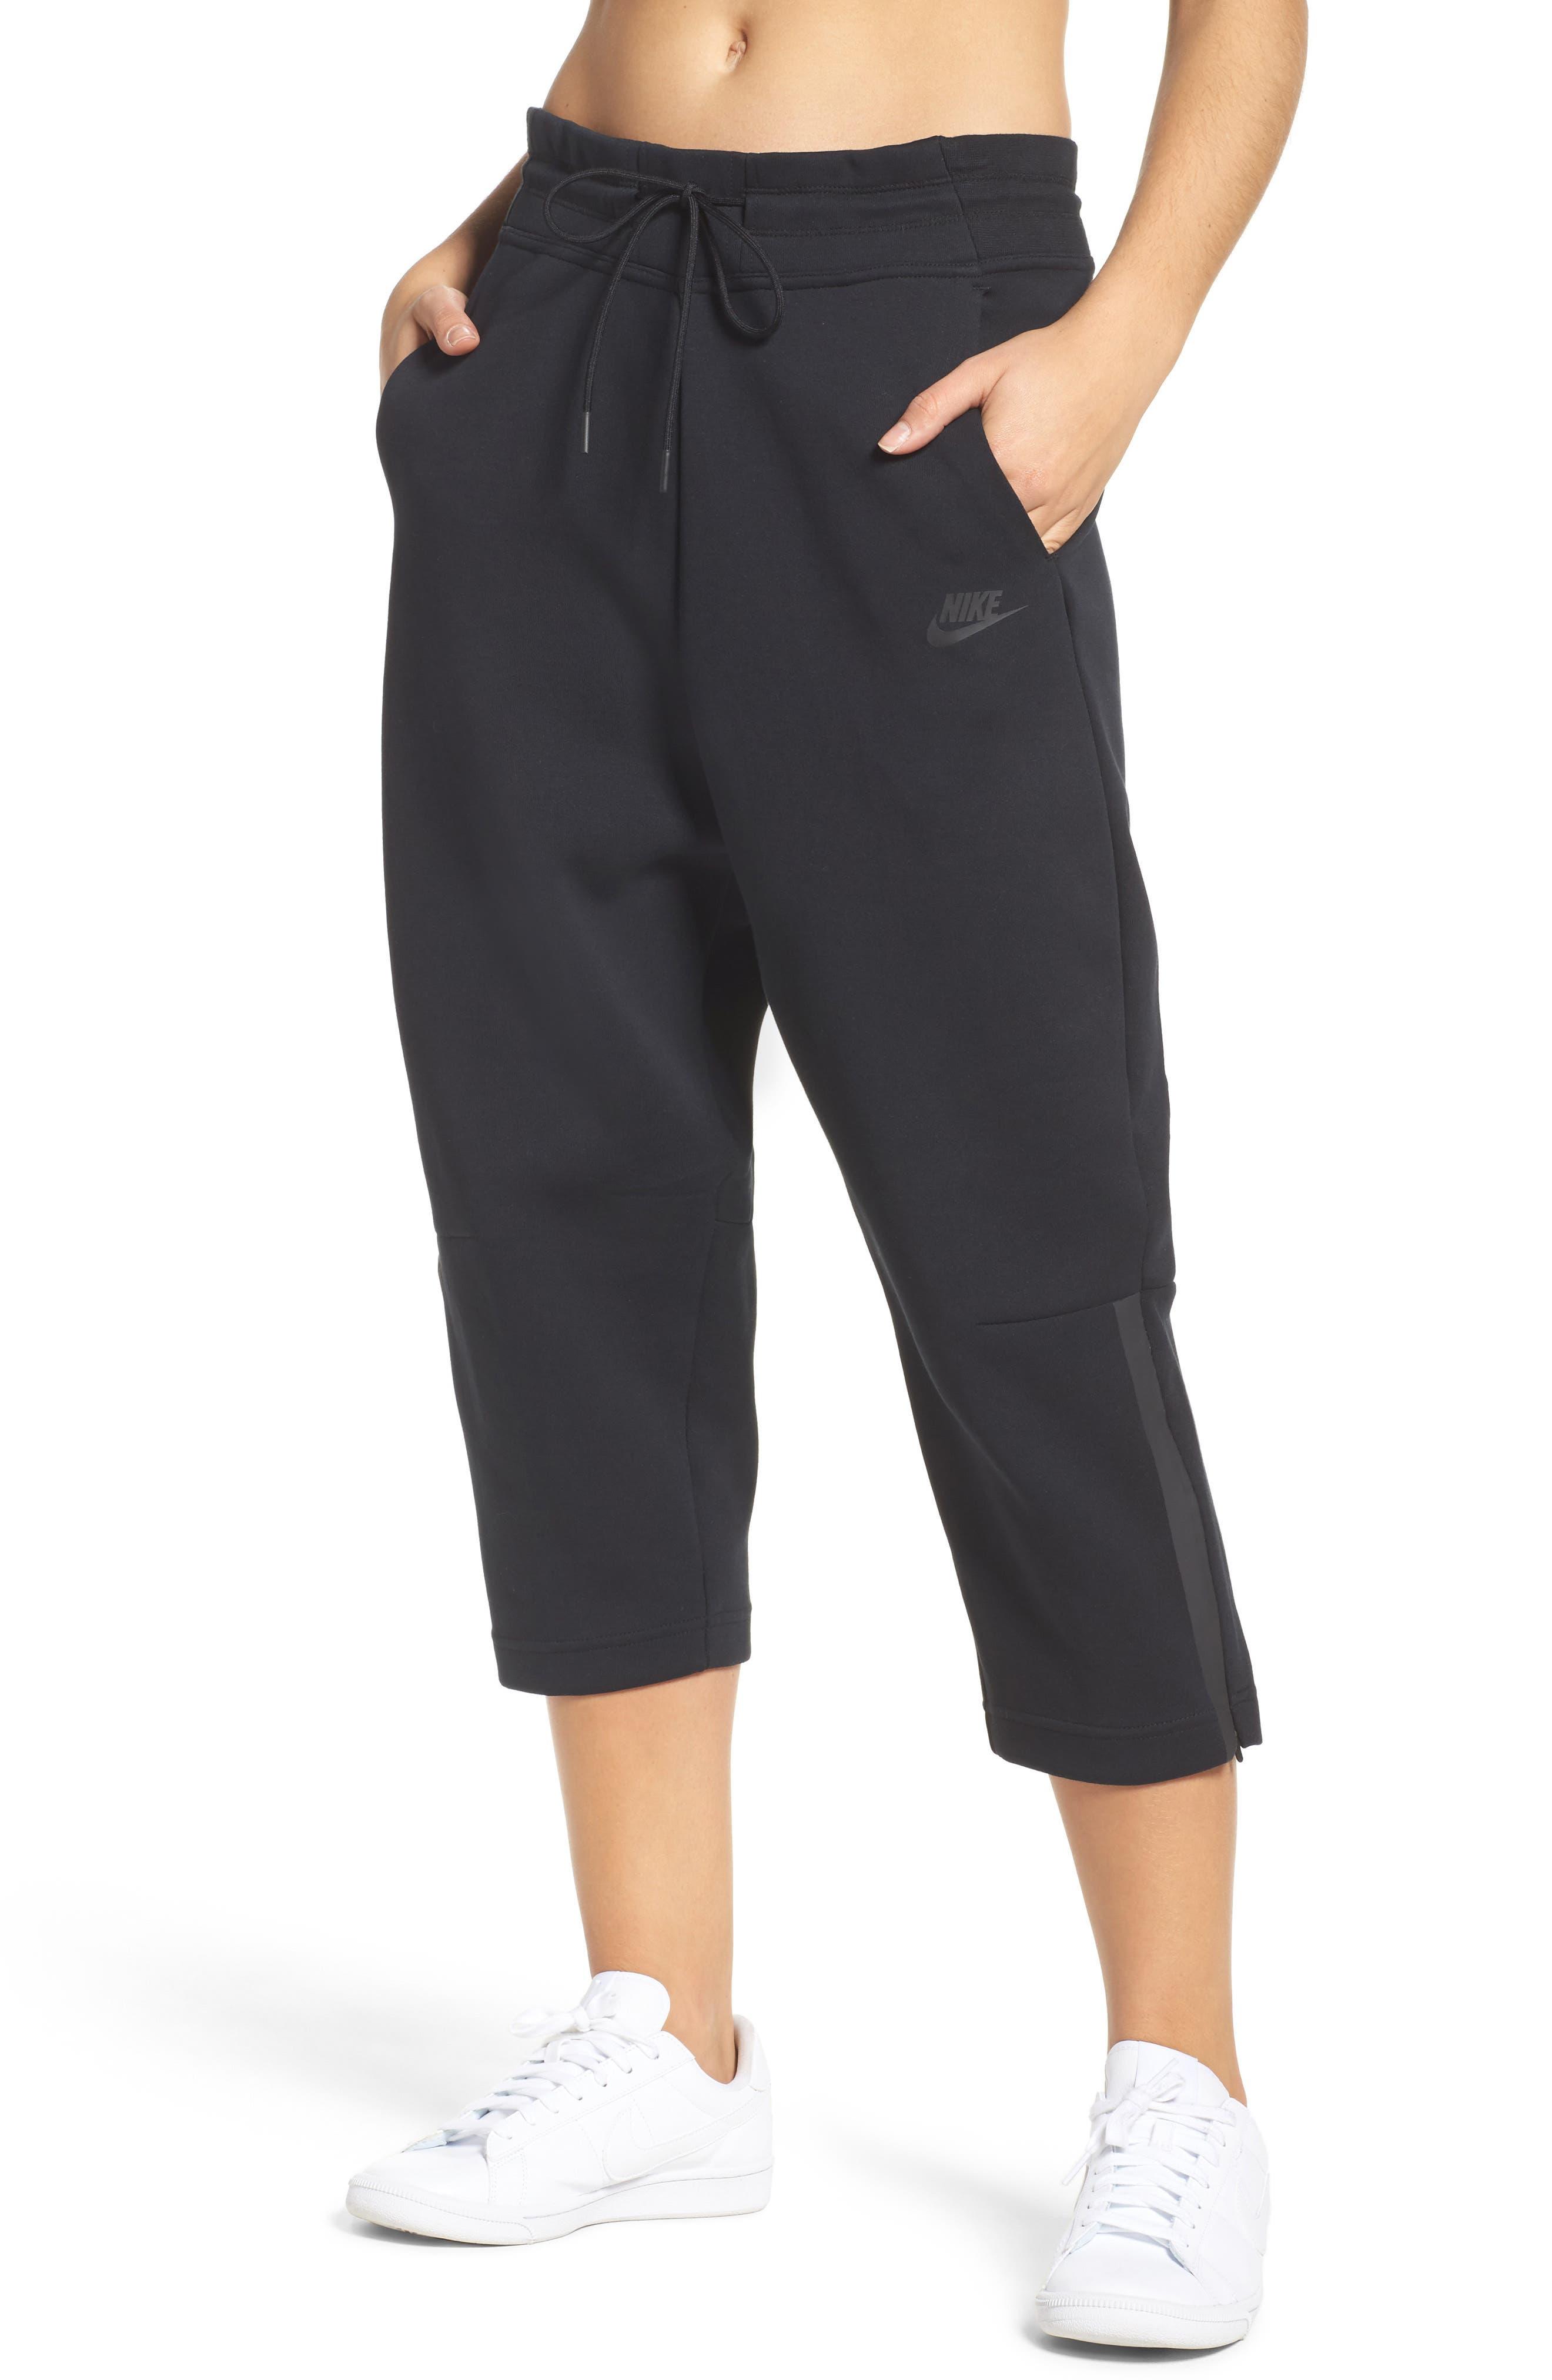 Capri Sweatpants,                         Main,                         color, 010